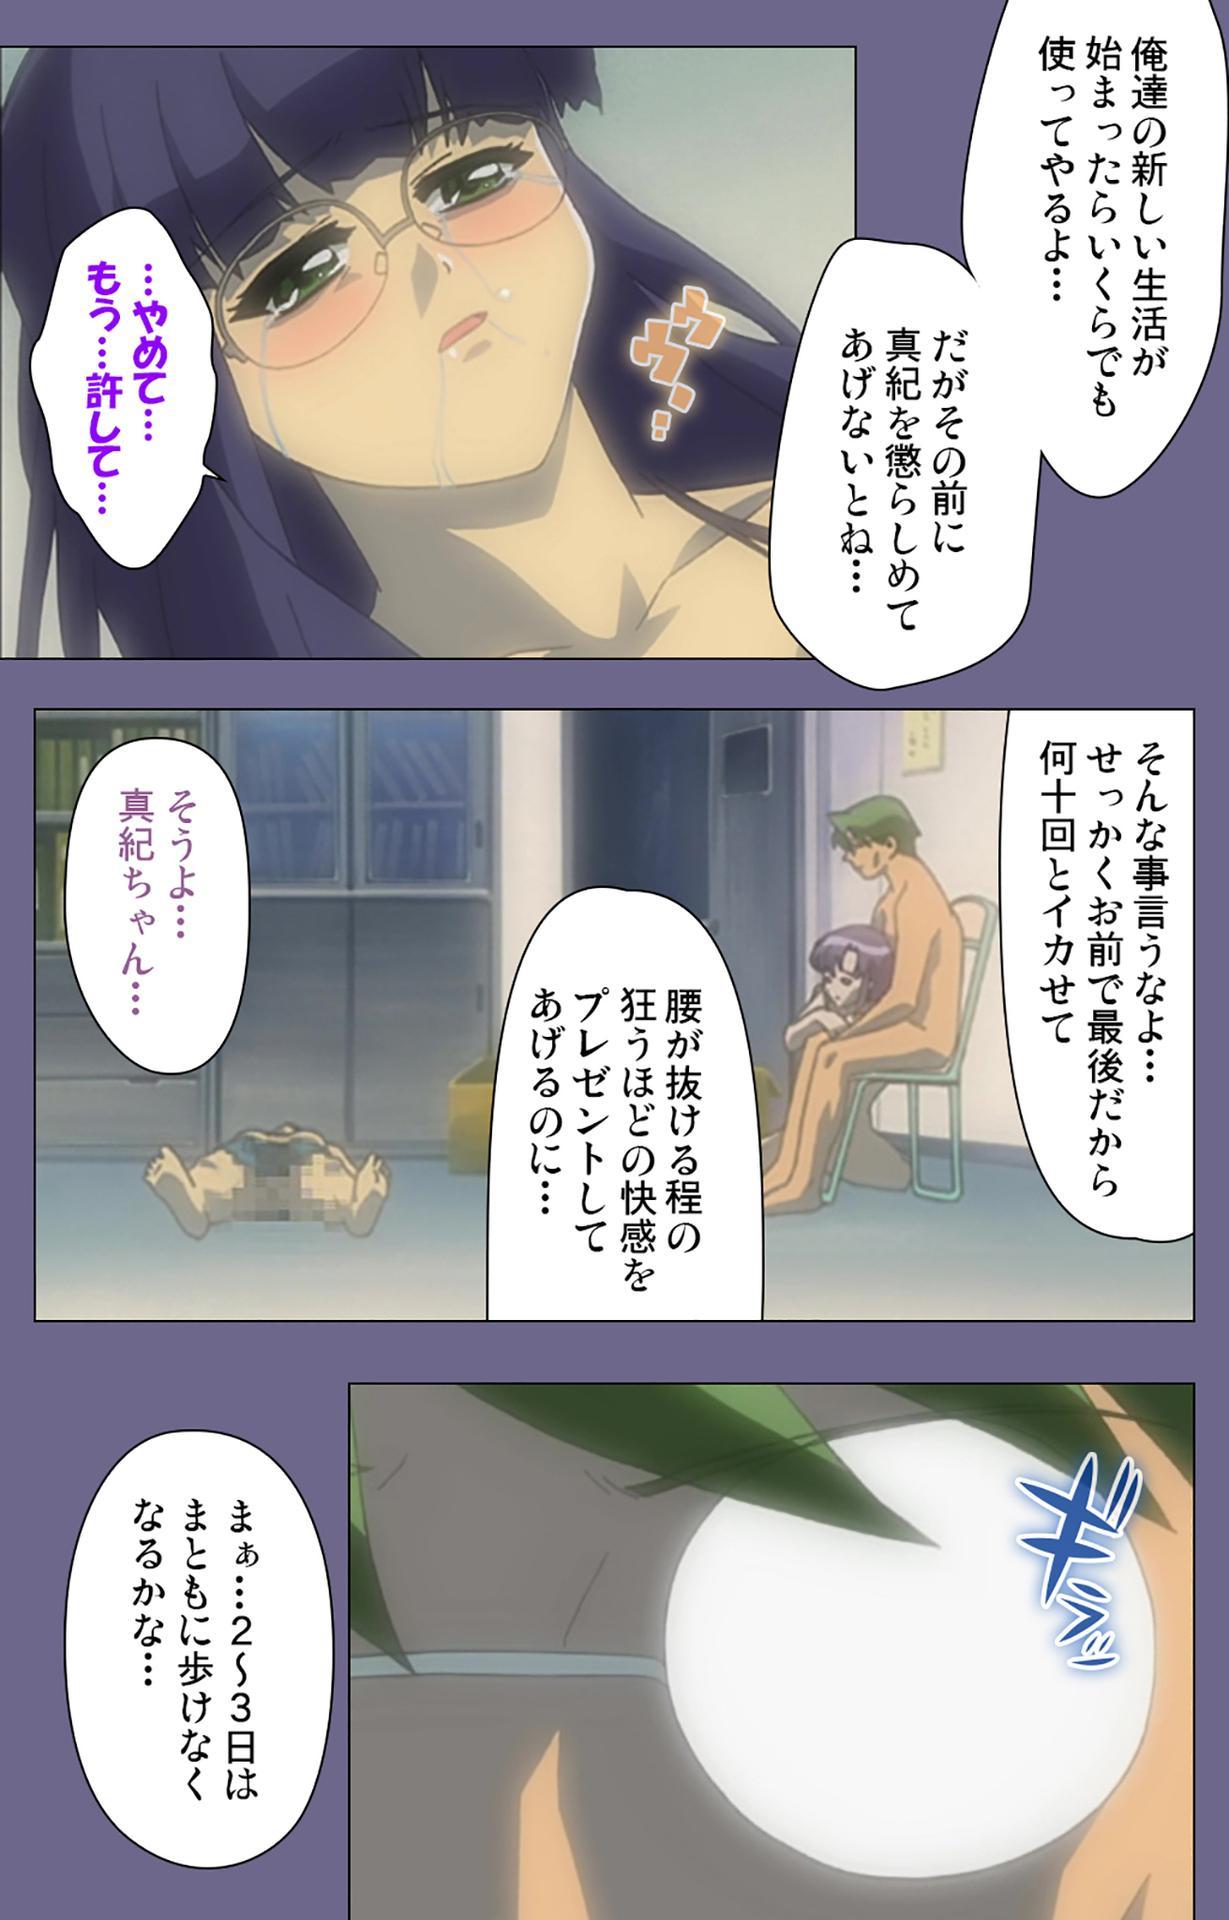 Korashime Kanzenban 234